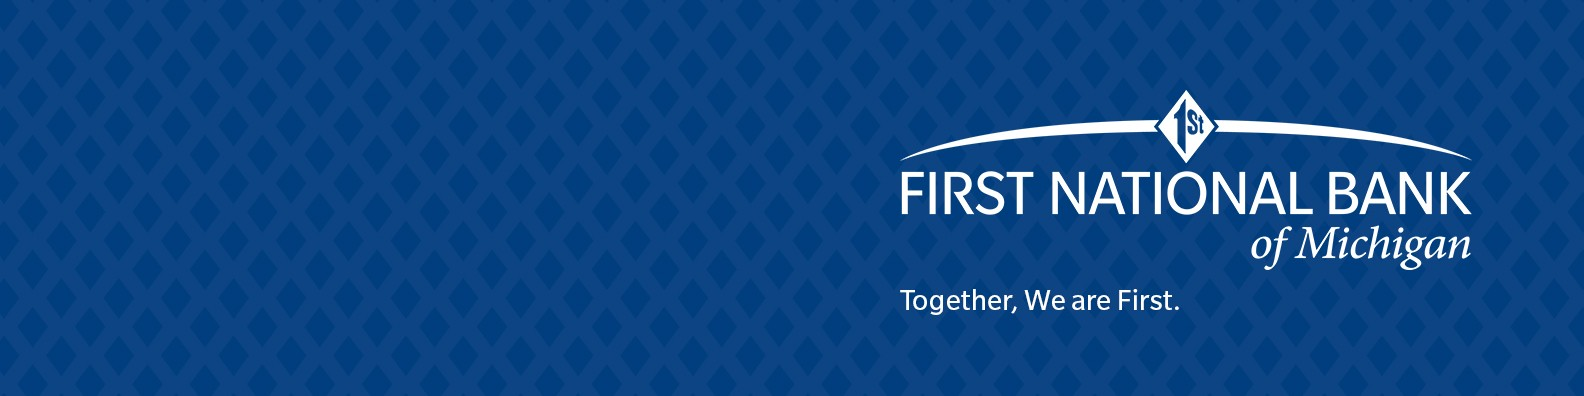 First National Bank of Michigan | LinkedIn